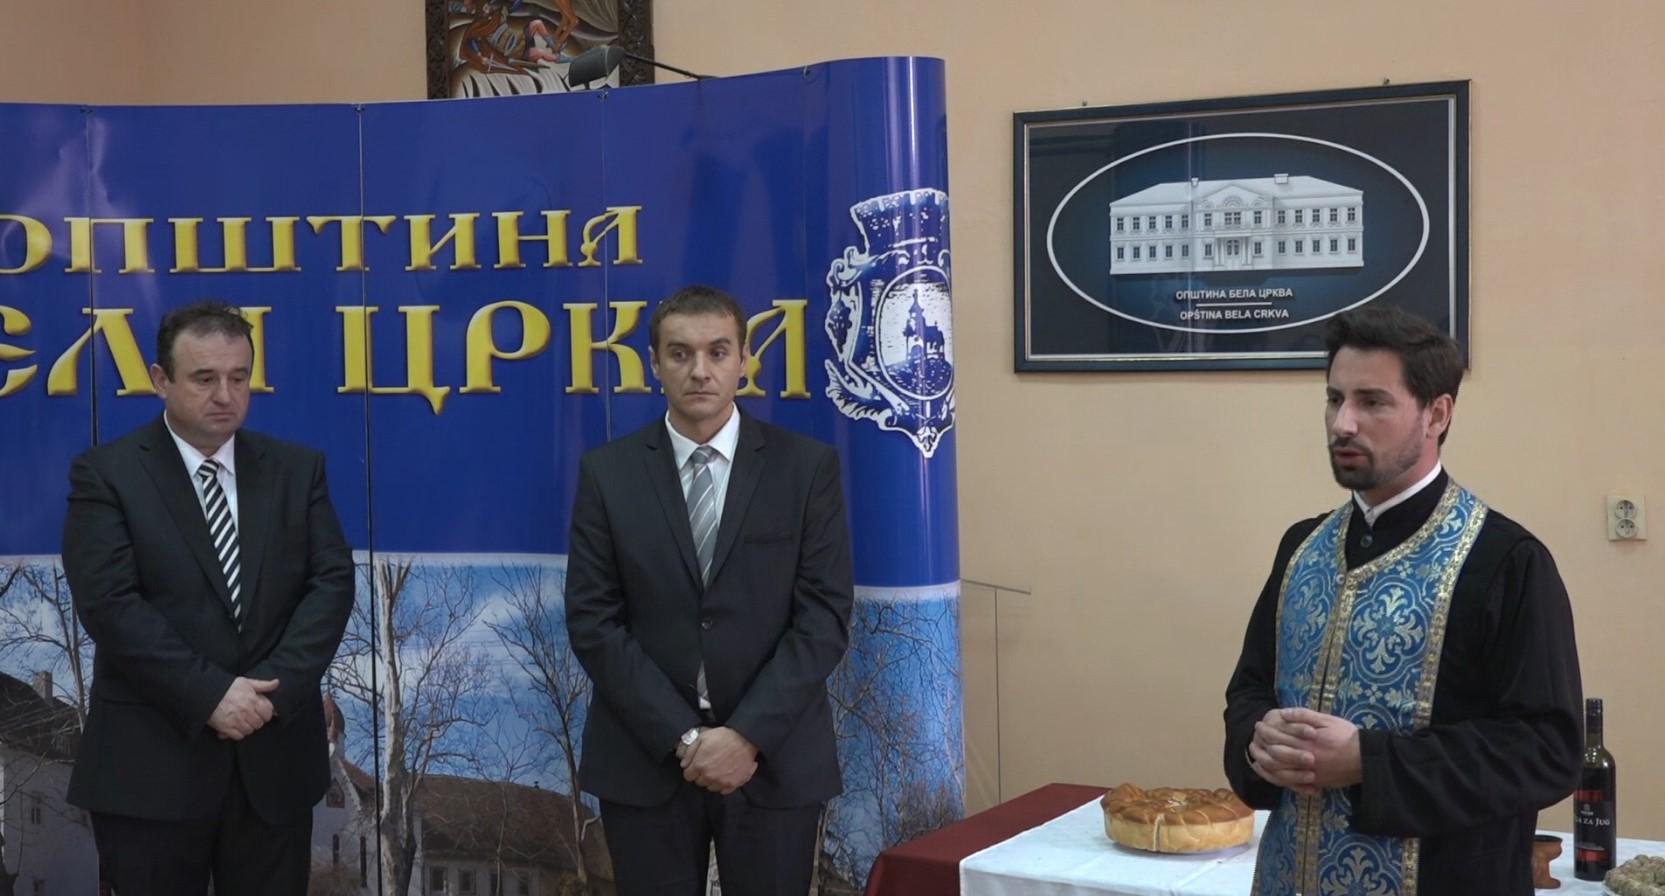 Mitrovdan slava Opštine